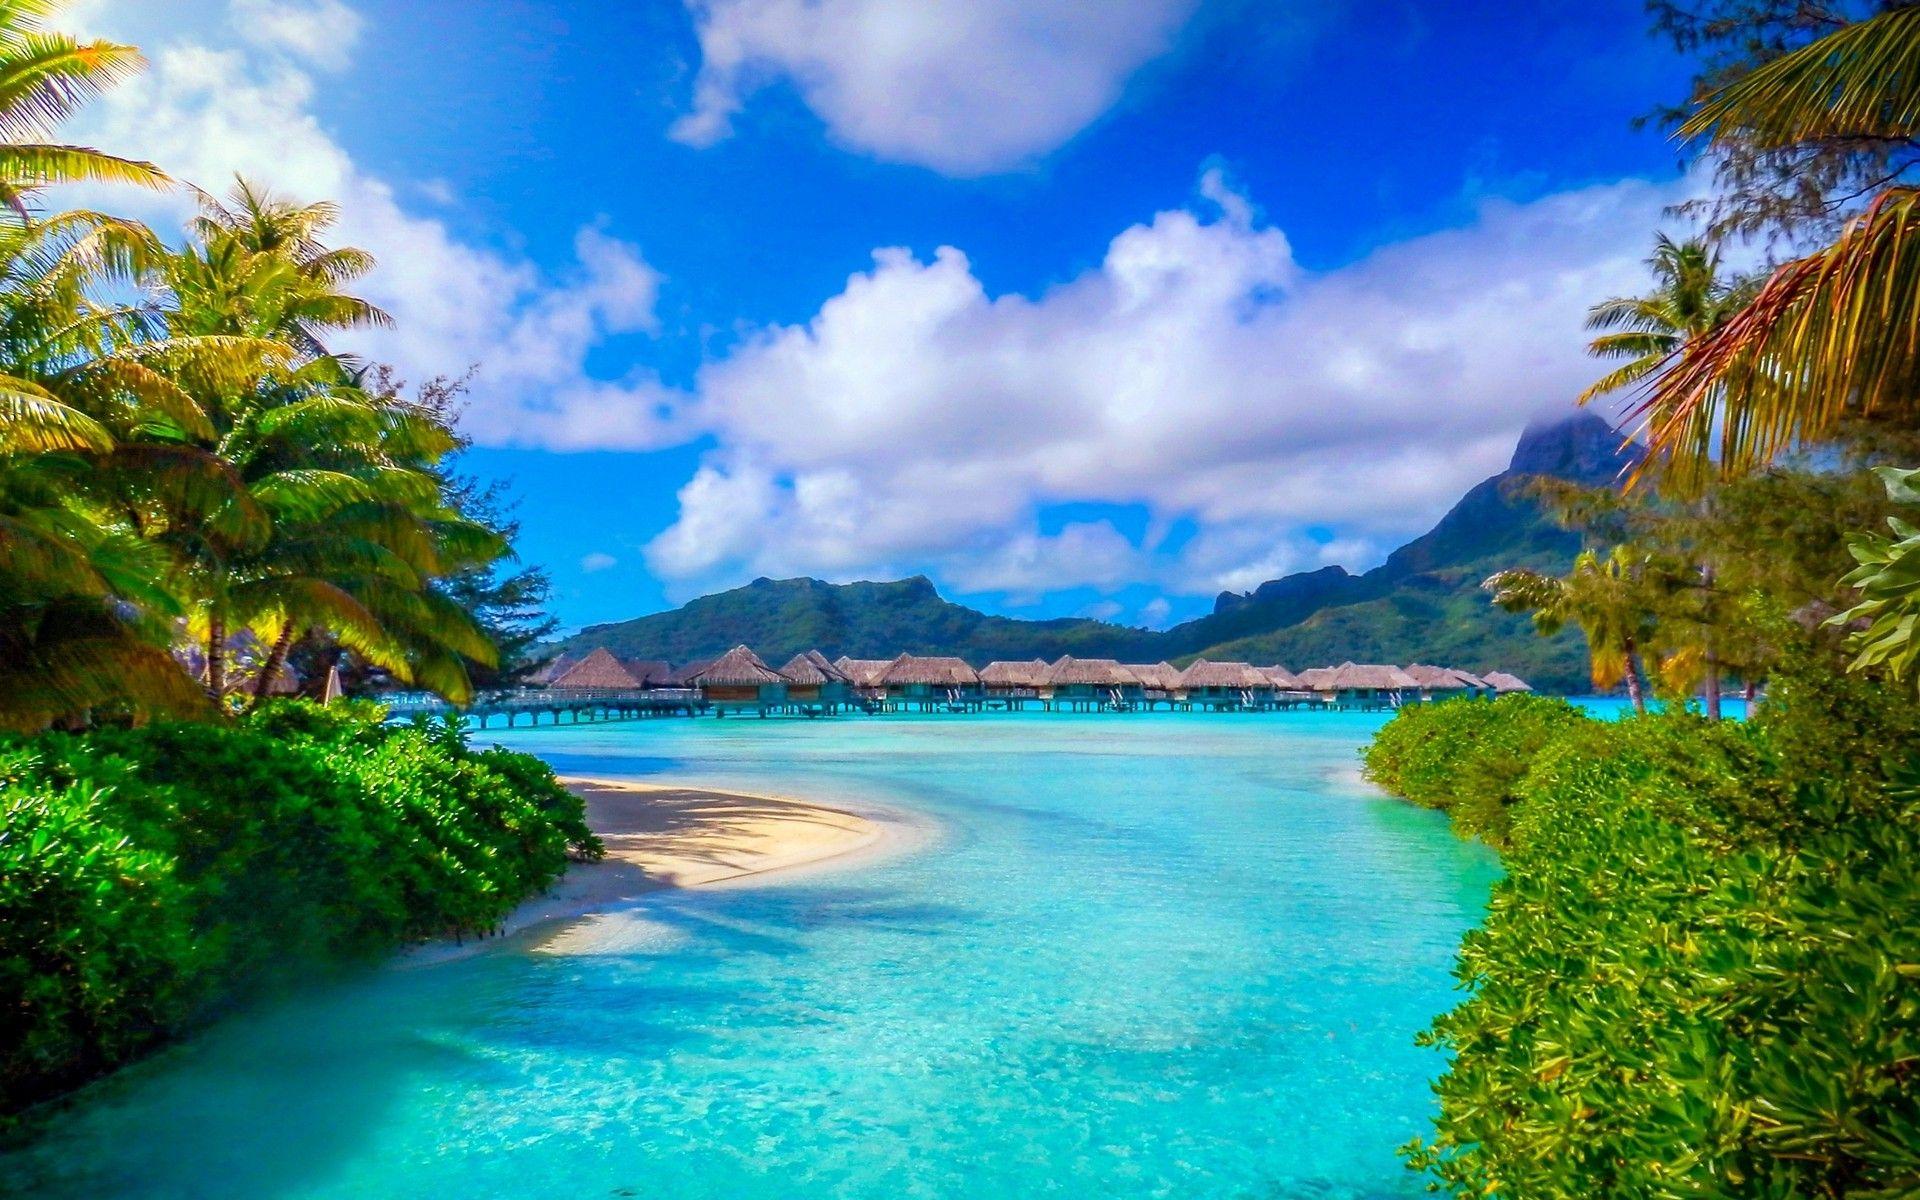 pinlinda mickle on dream vaca,best beaches | pinterest